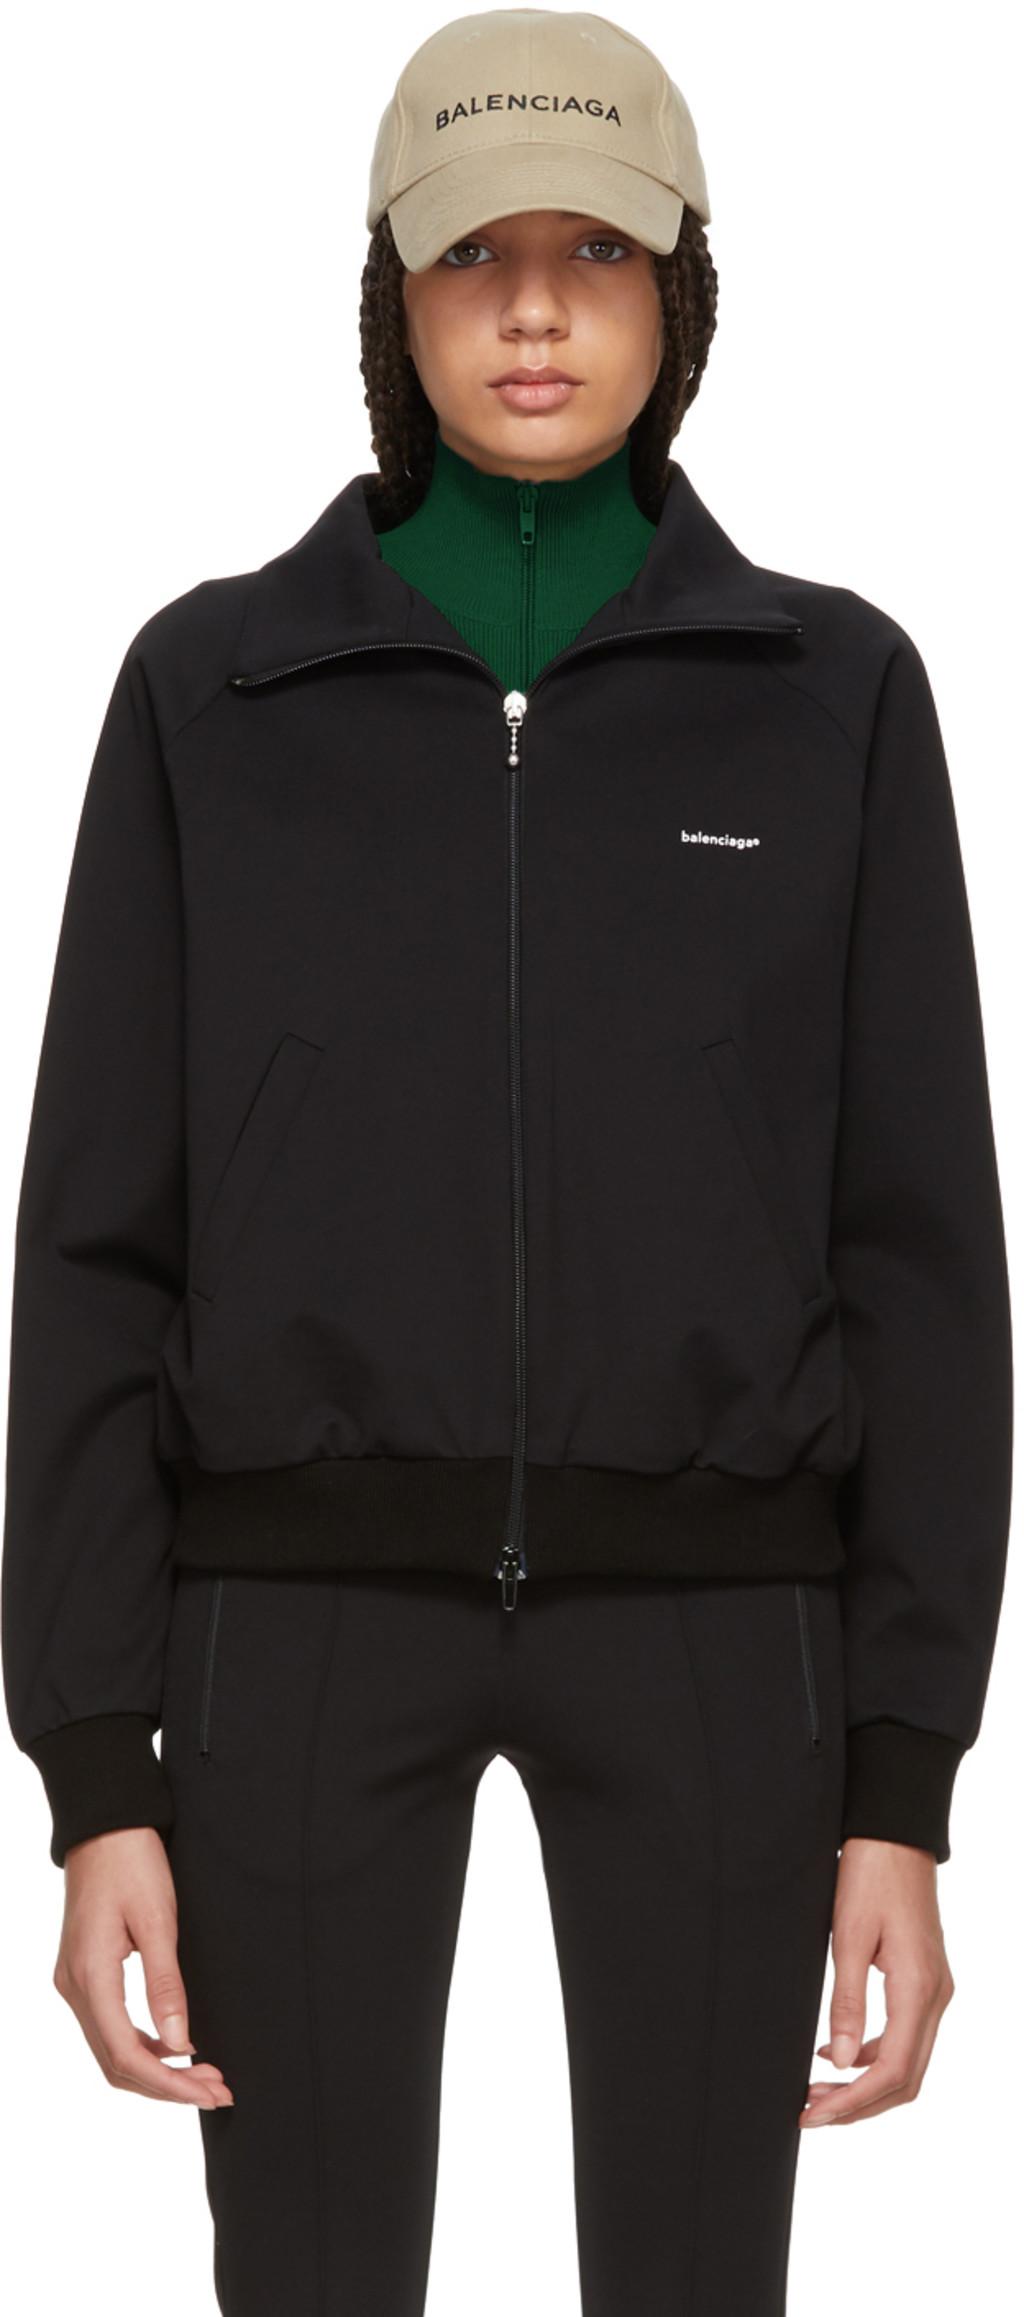 balenciaga hoodie womens price